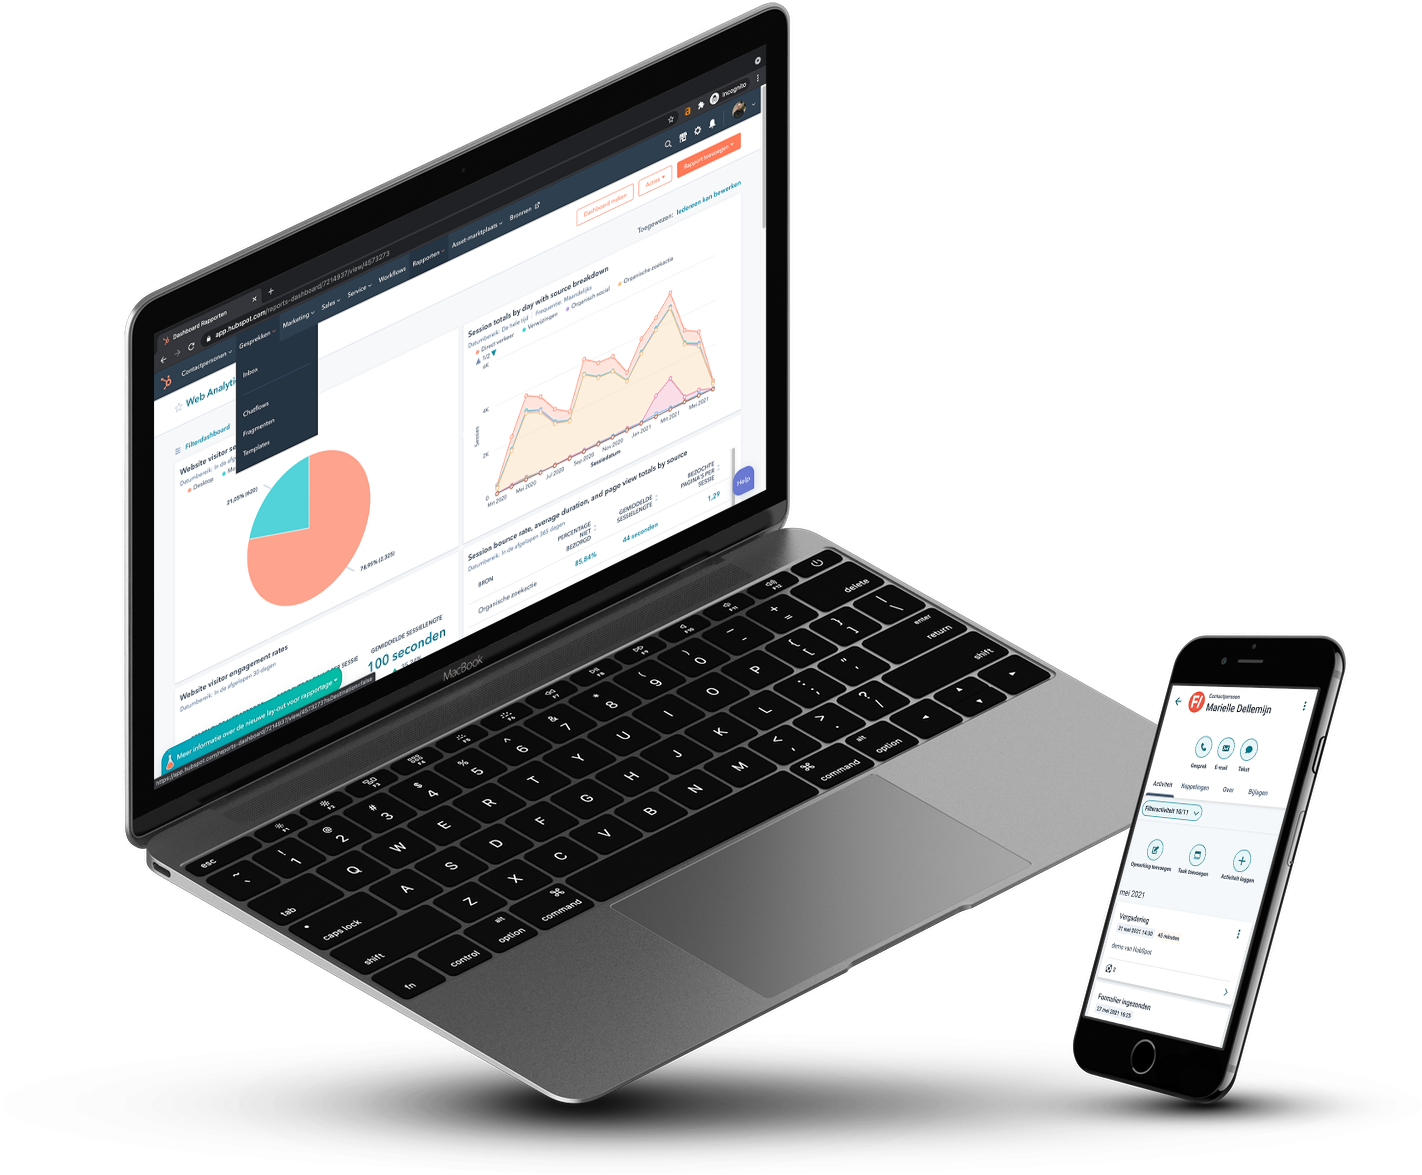 hubspot demo screens laptop iphone